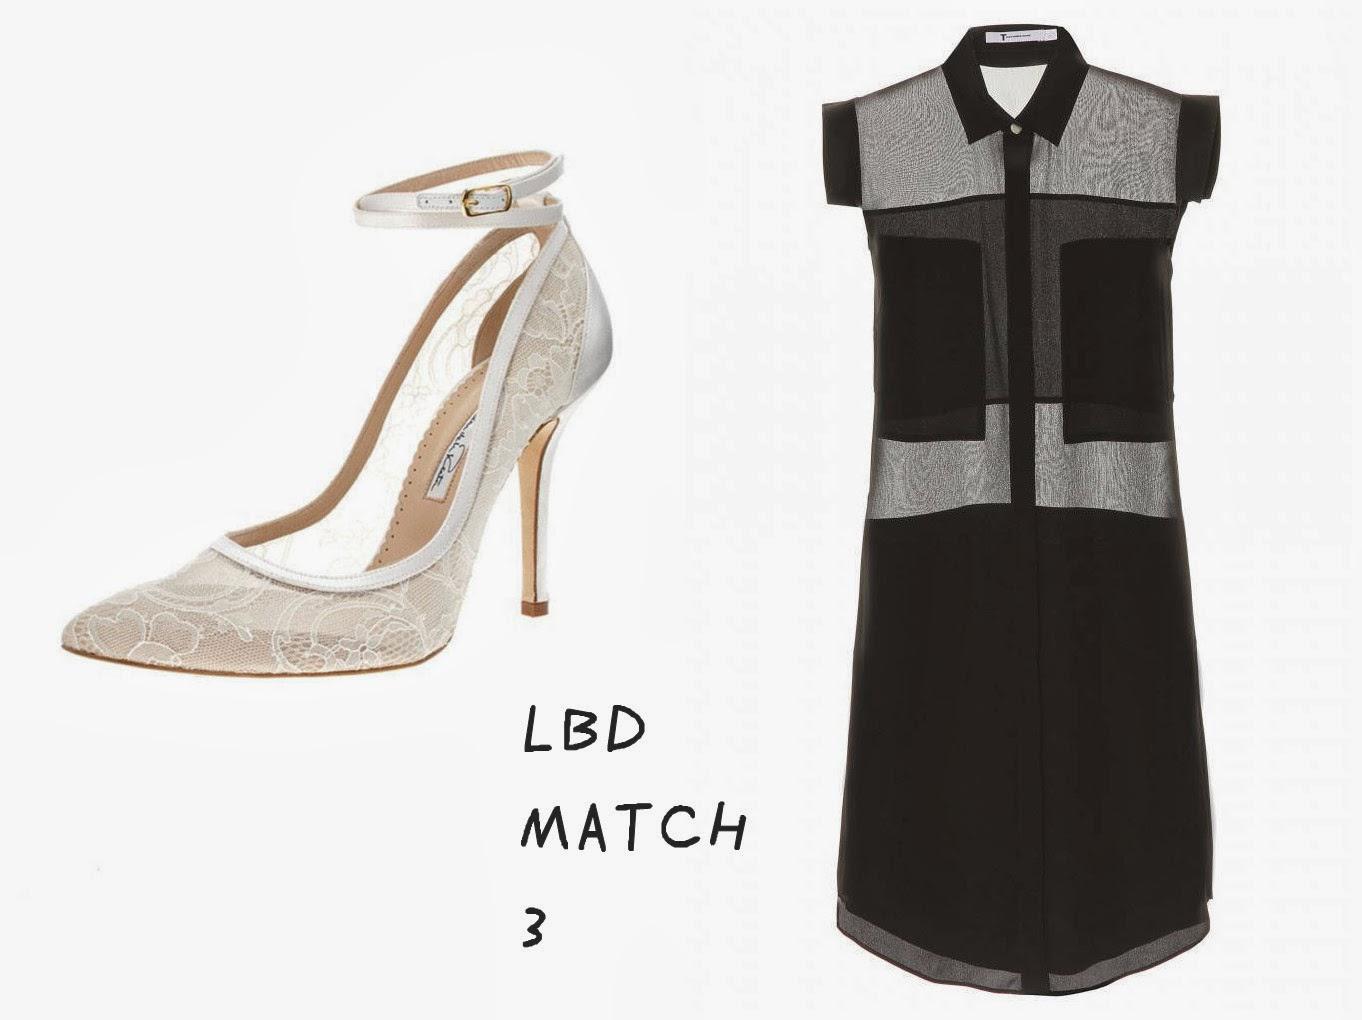 LBD match 3